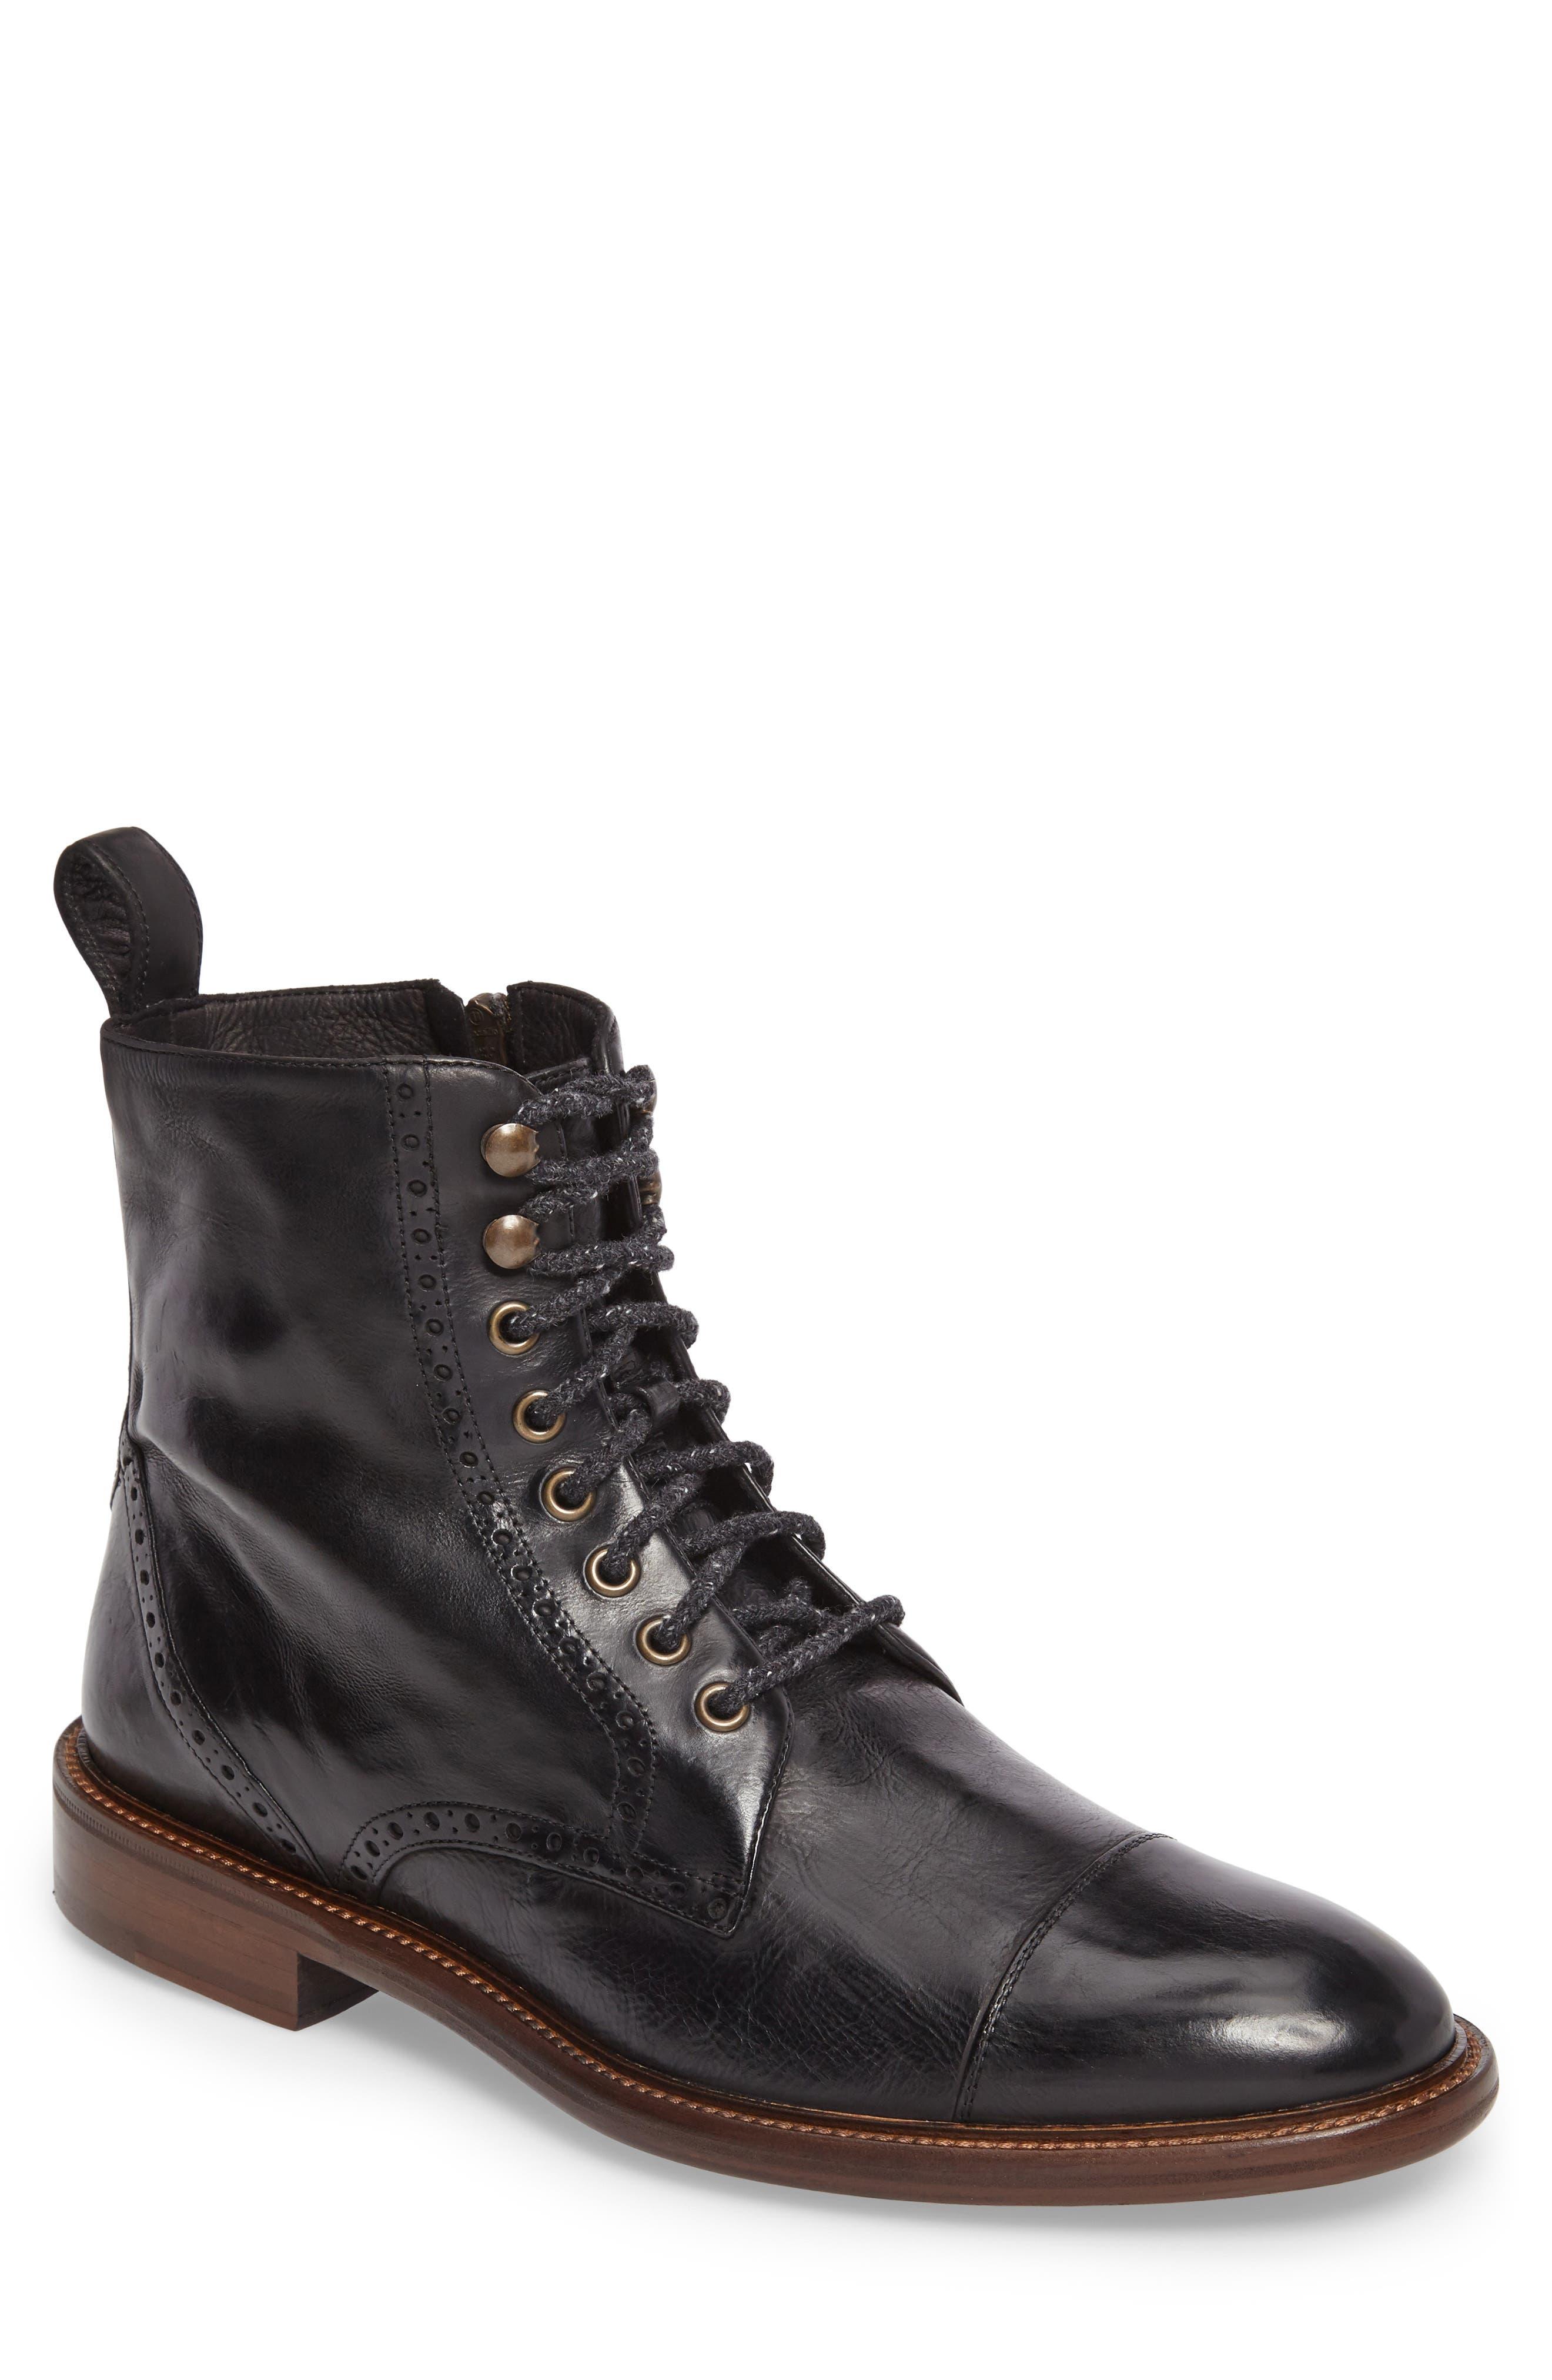 Bryson Cap Toe Boot,                         Main,                         color, 001